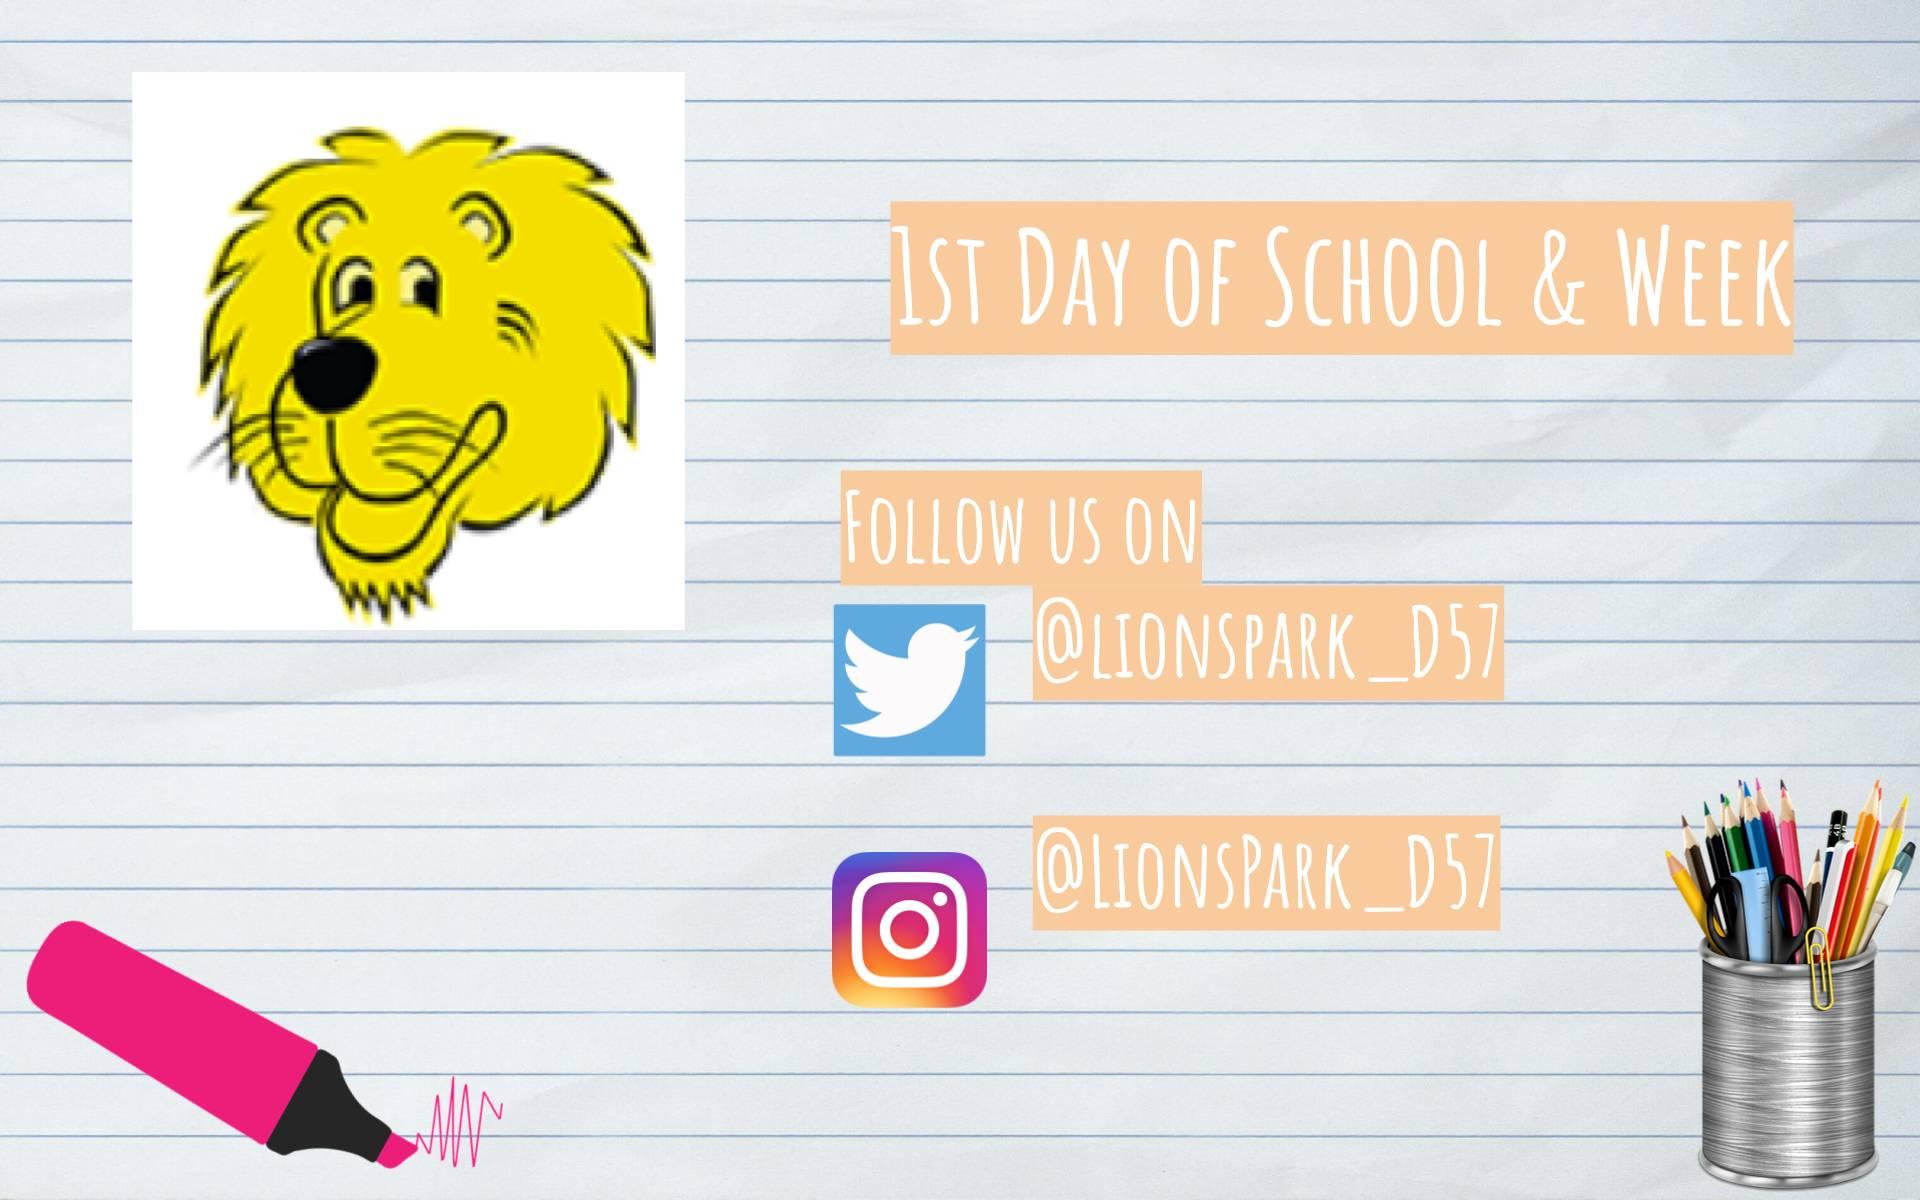 1st Day of School Photos